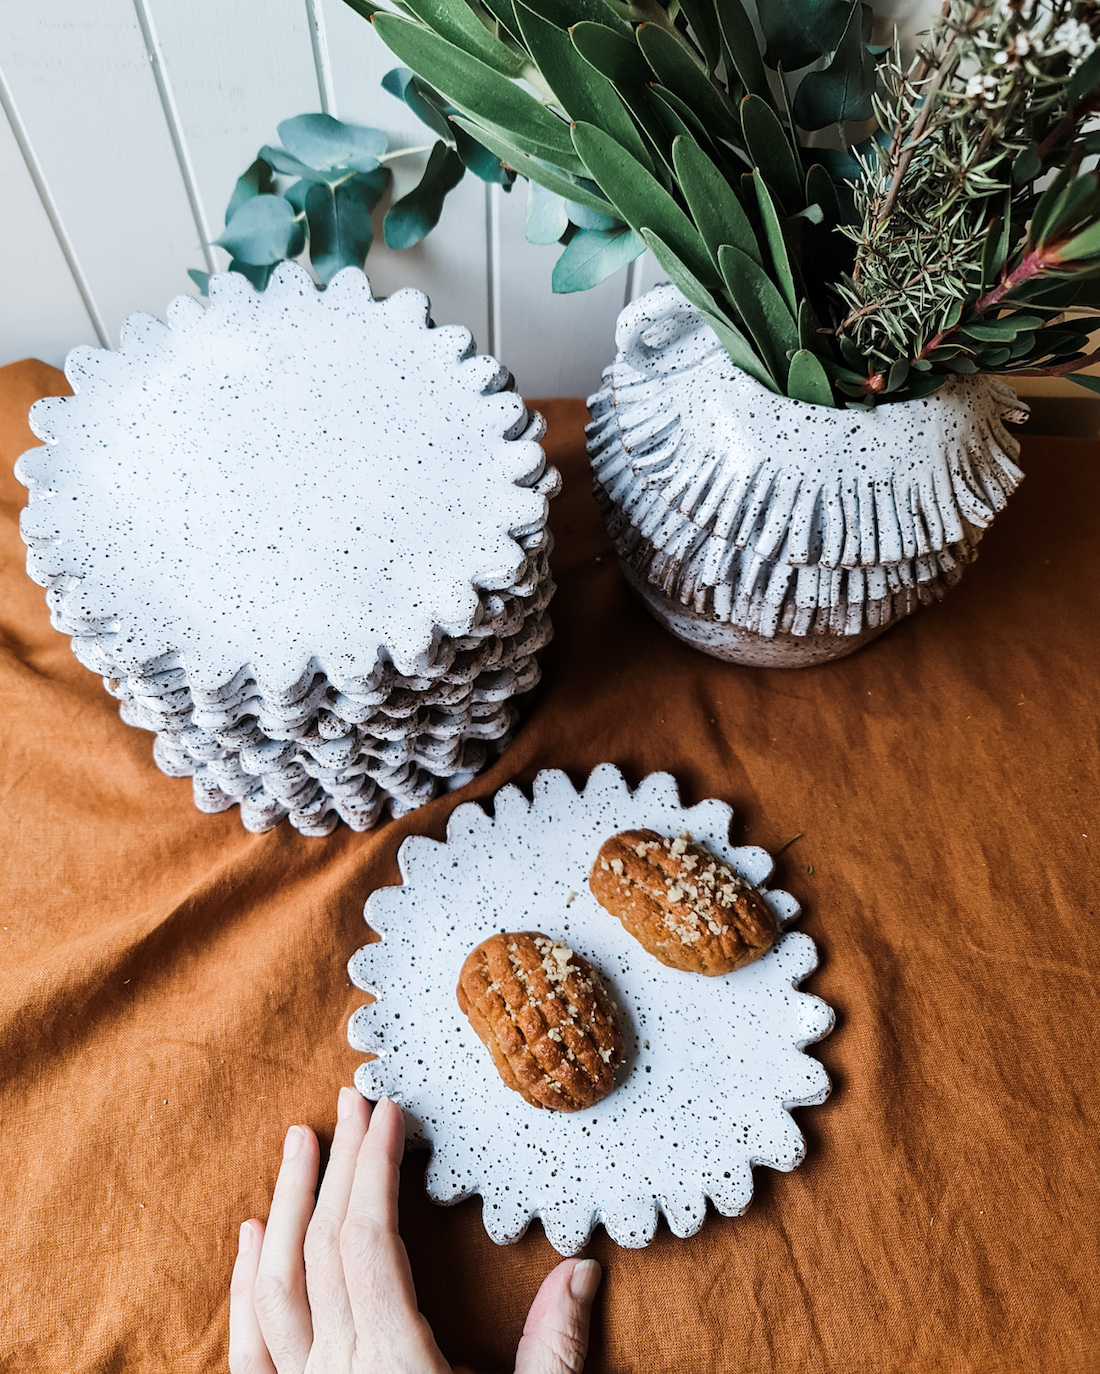 The Seasonal Ceramicist_flower plates_Imperfect textural ceramics